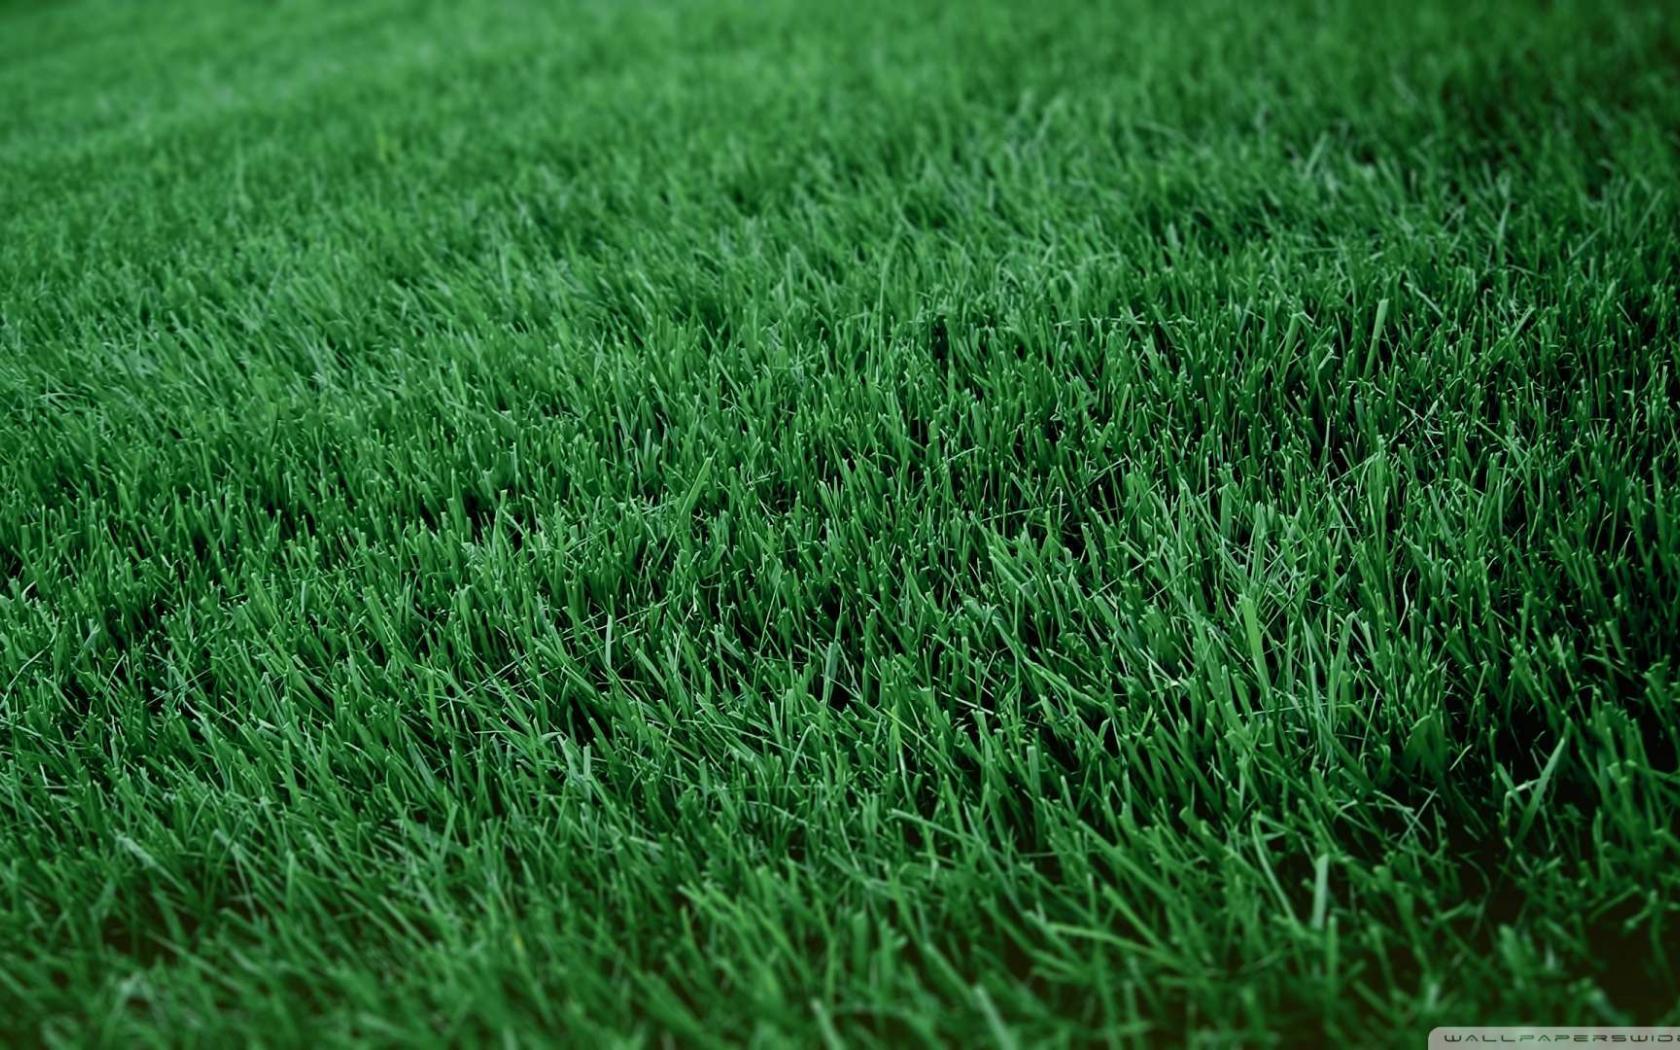 Free Download Wallpaper Fresh Cut Grass Wallpaper 1080p Hd Upload